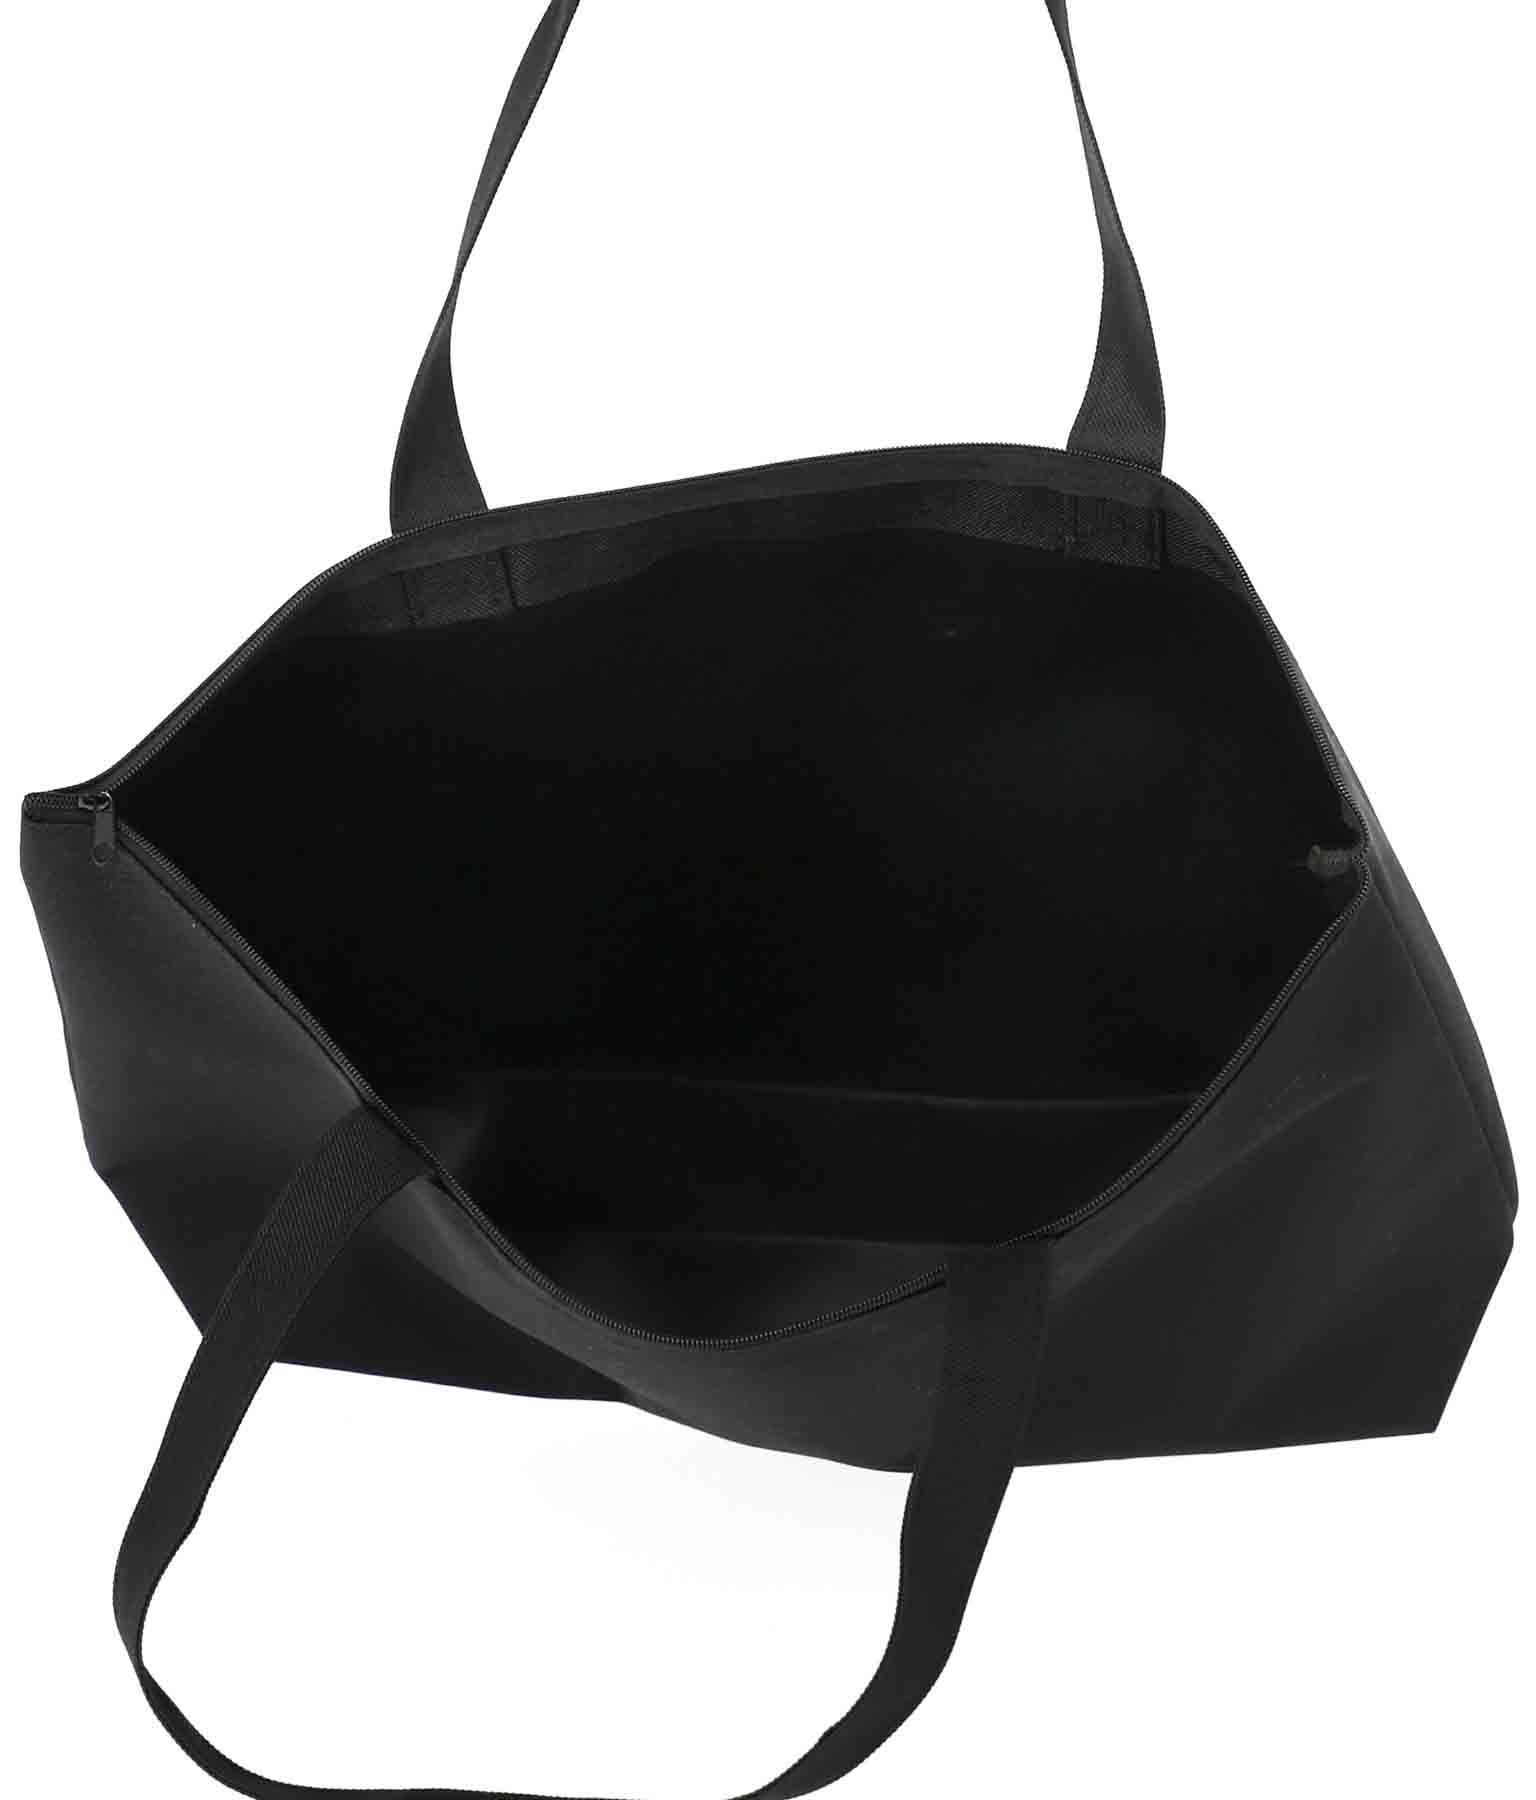 ANAPロゴトートバッグ(バッグ・鞄・小物/トートバッグ) | ANAP